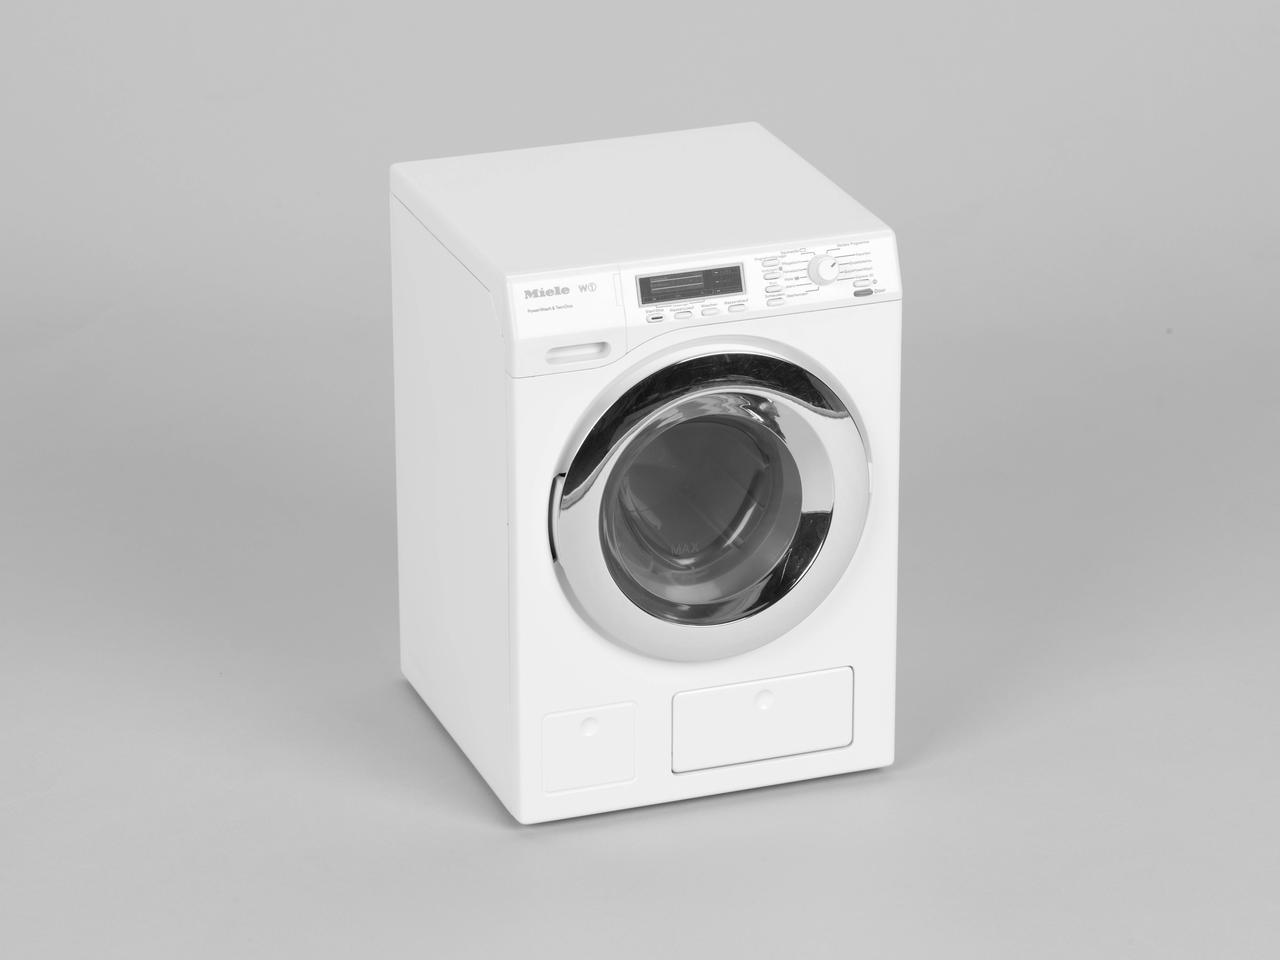 Игрушечная стиральная машина Miele Klein 6941